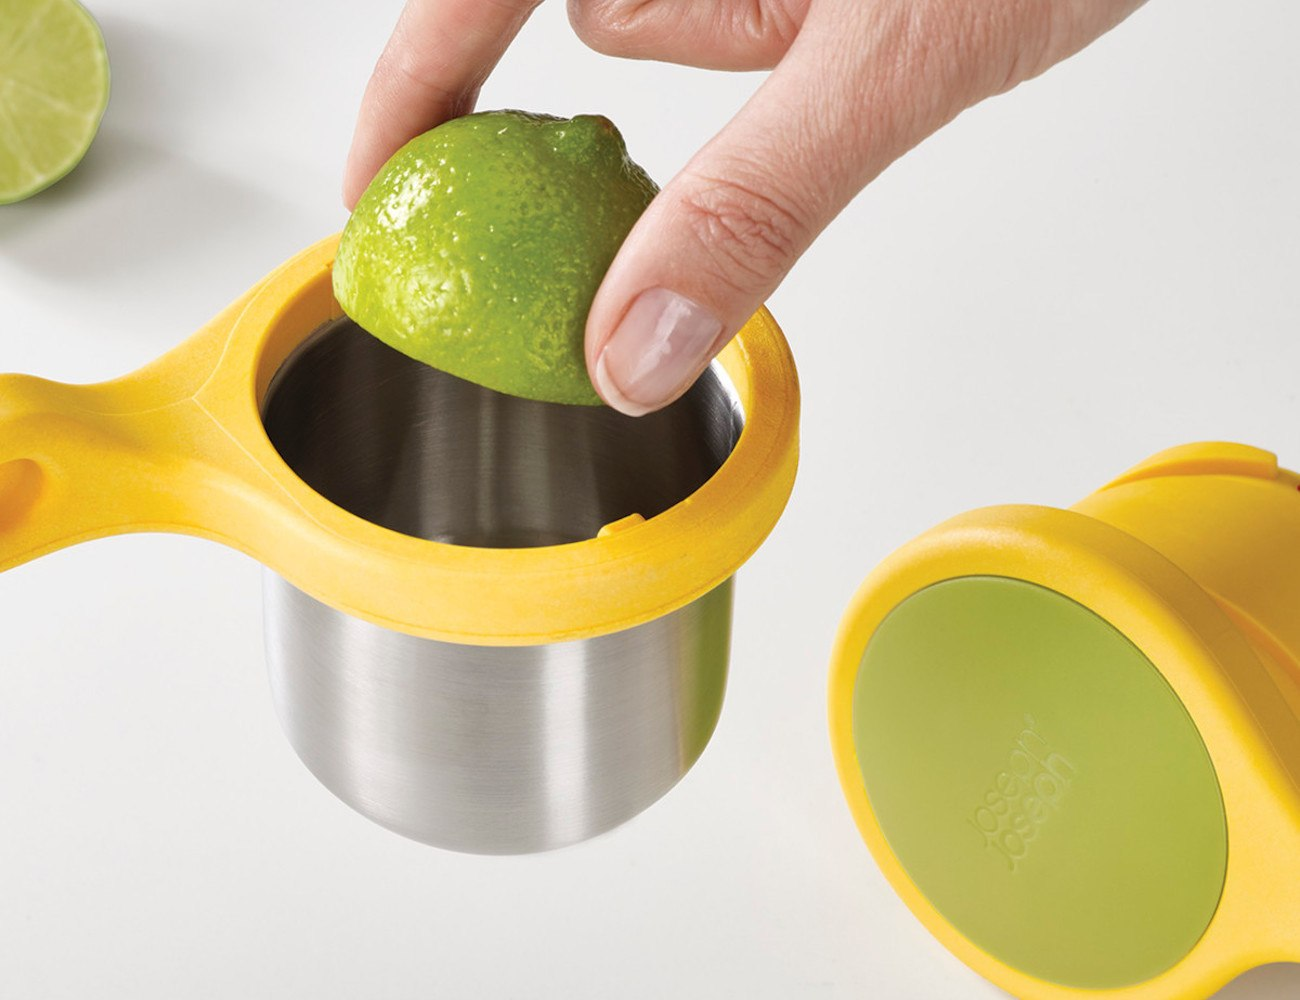 Helix Hand-Held Citrus Press